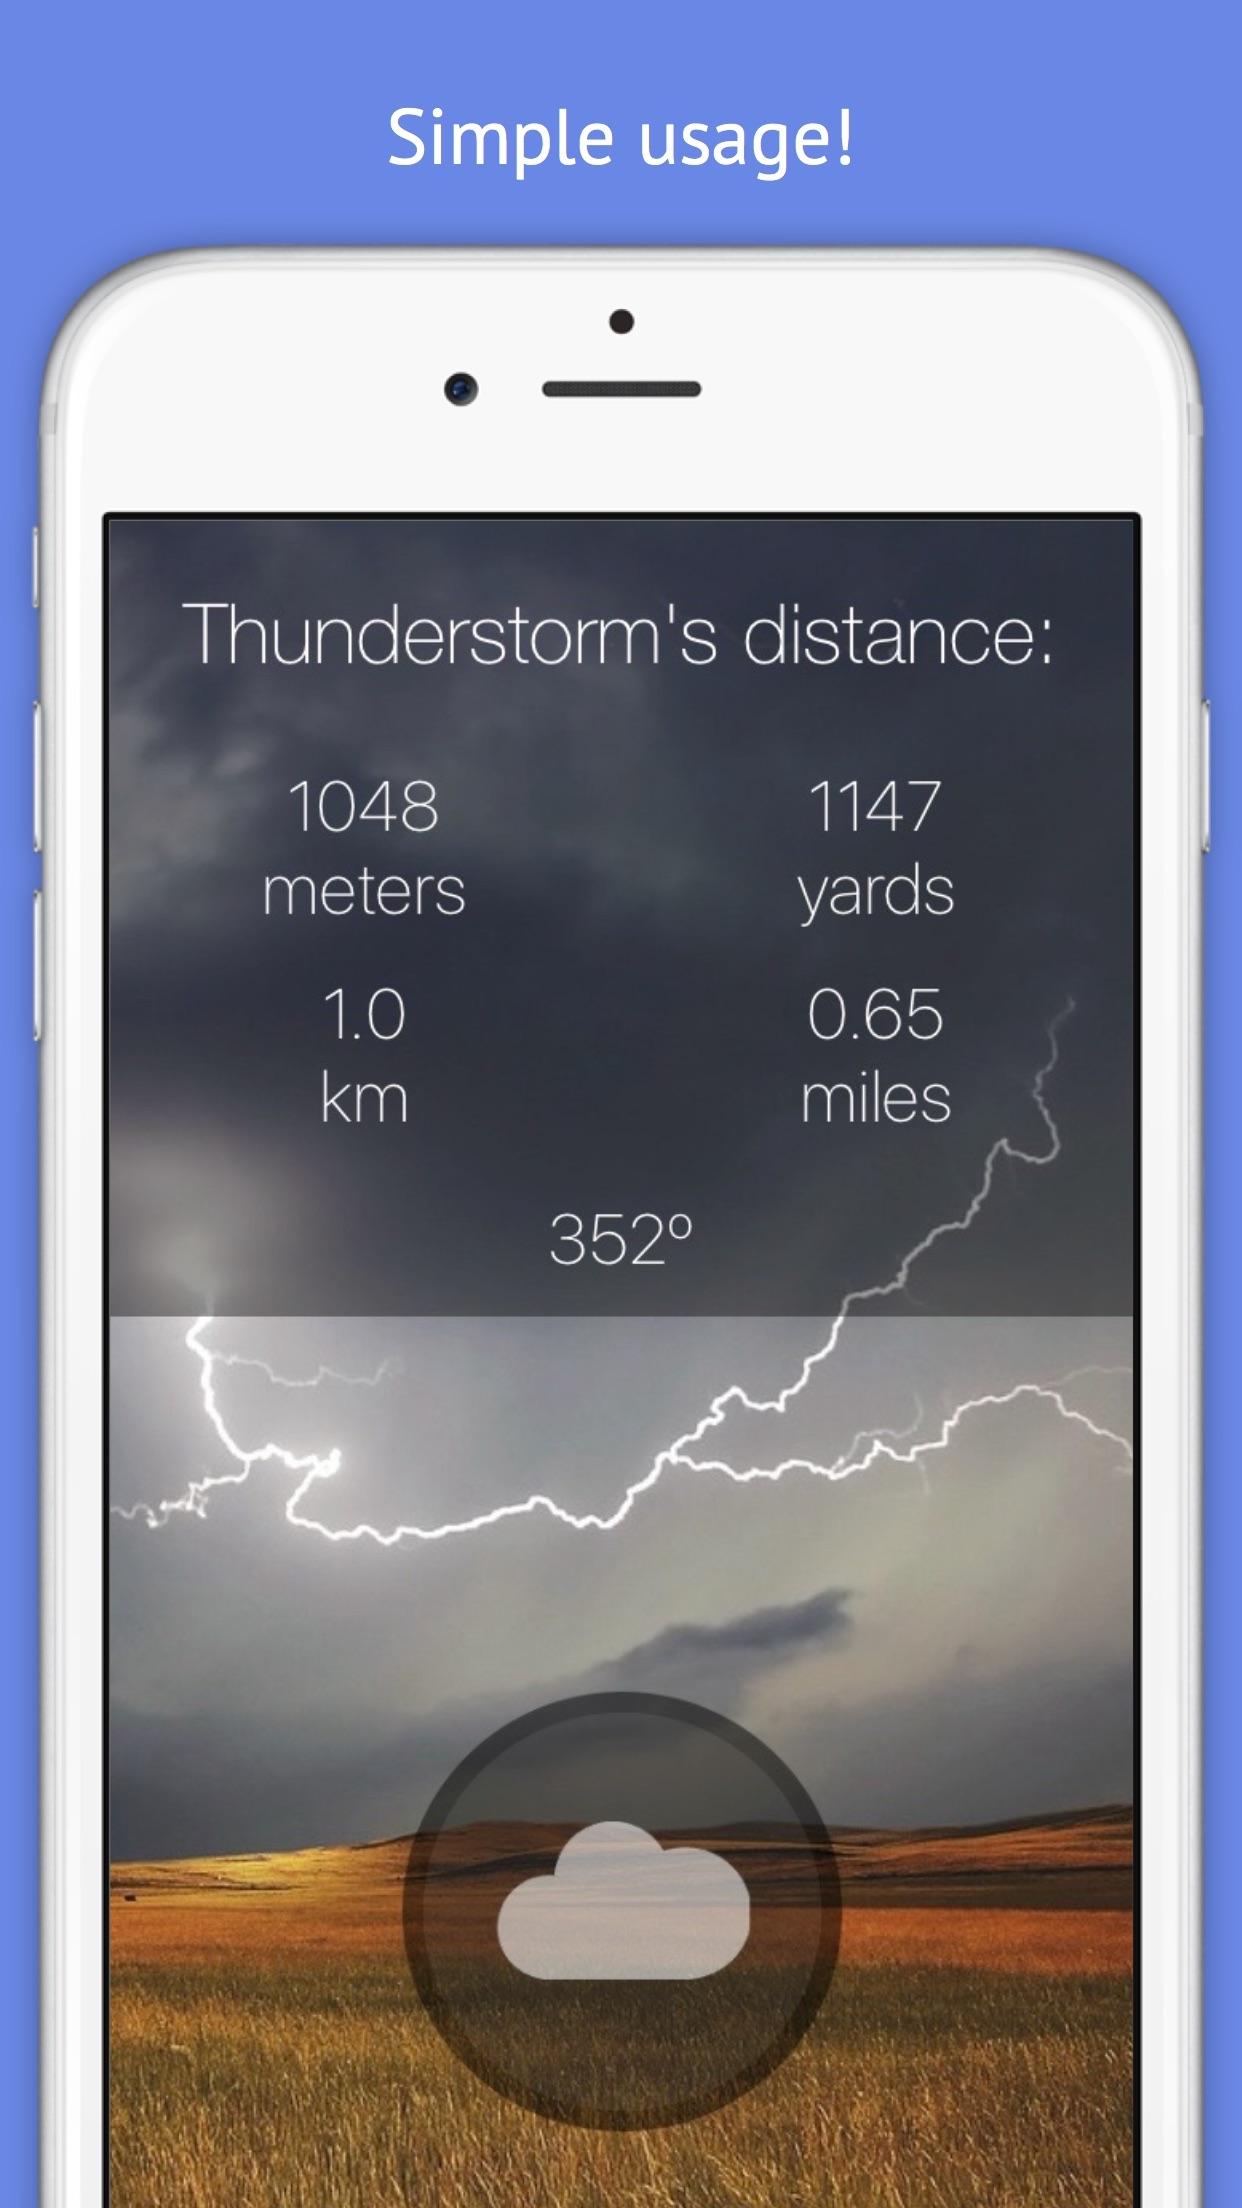 Thunderstorm Location Calculator - Get Distance & Location of the next Thunderstorm! Screenshot